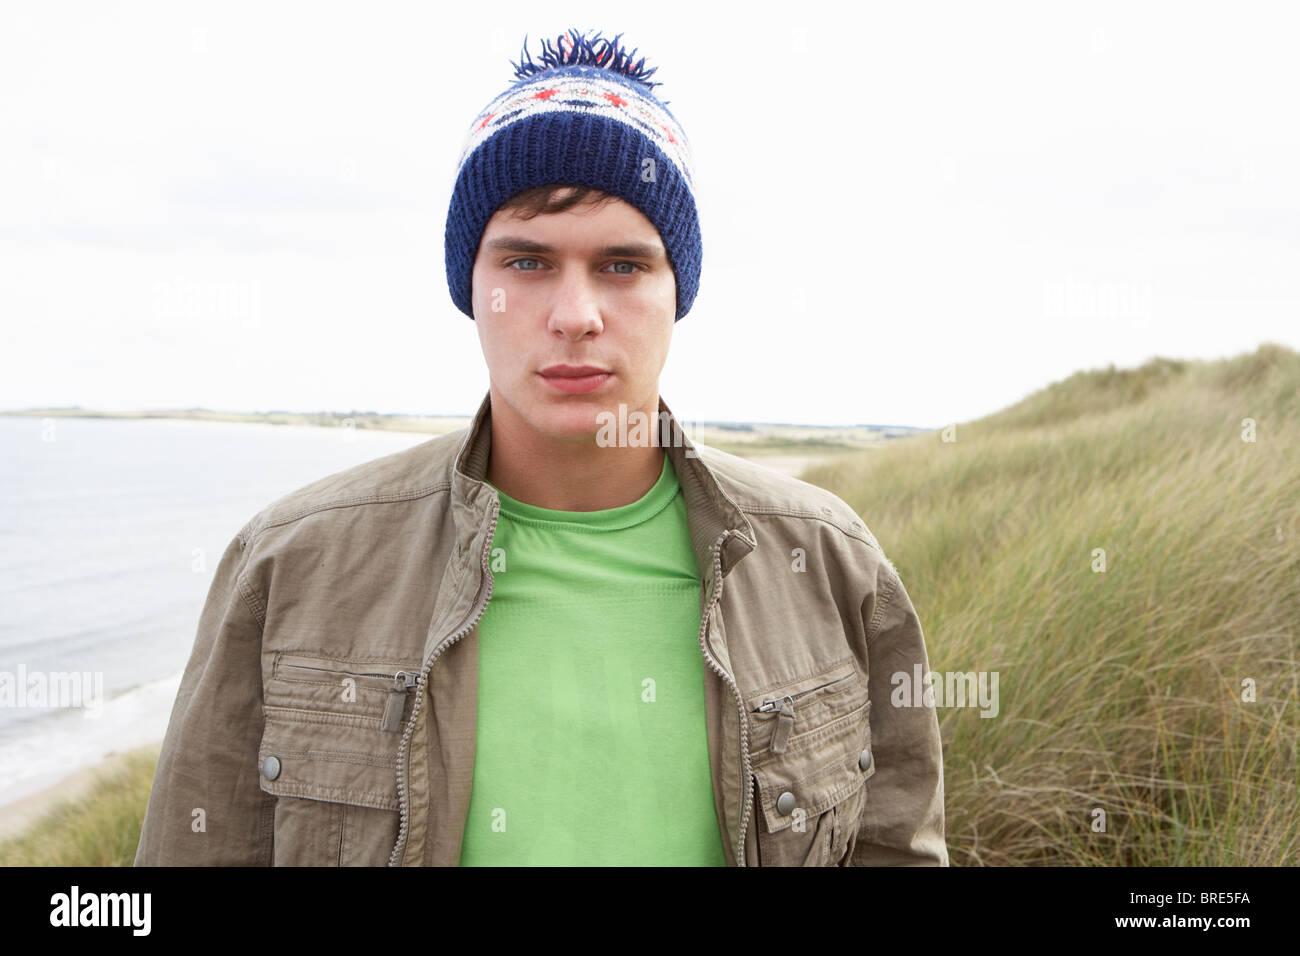 Teenage Boy Standing In Sand Dunes Wearing Woolly Hat - Stock Image